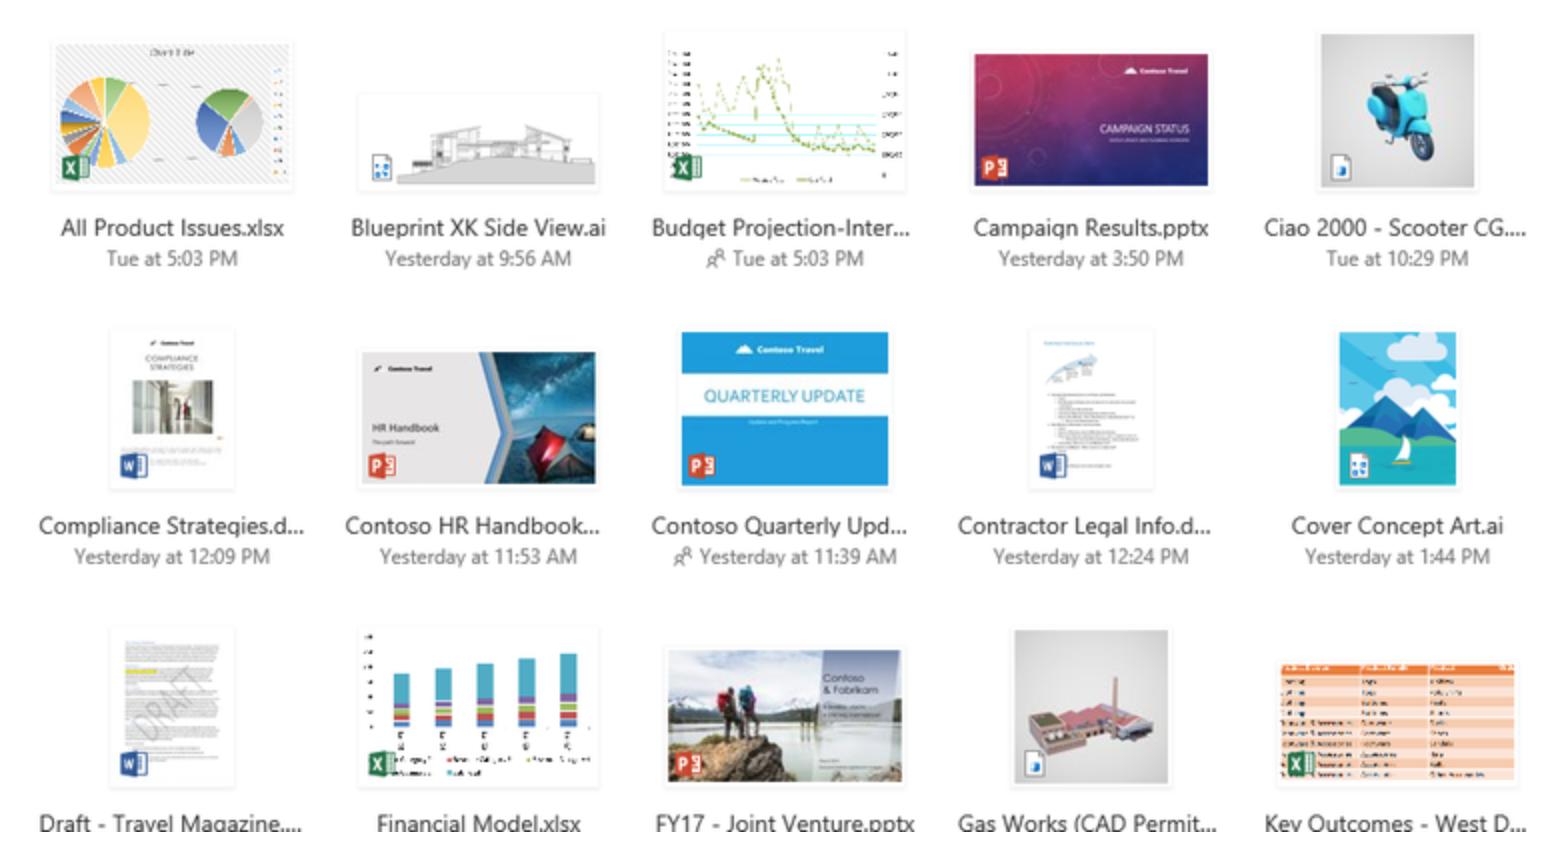 Tricky SharePoint: Microsoft Ignite 2017 Recap - Subjective View